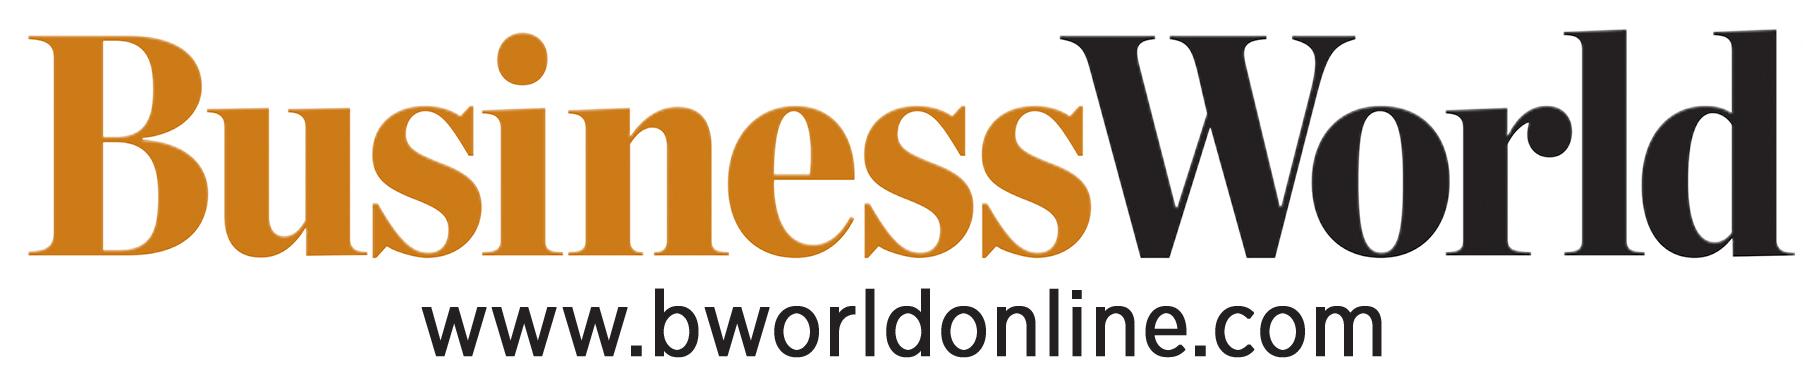 bworldonline